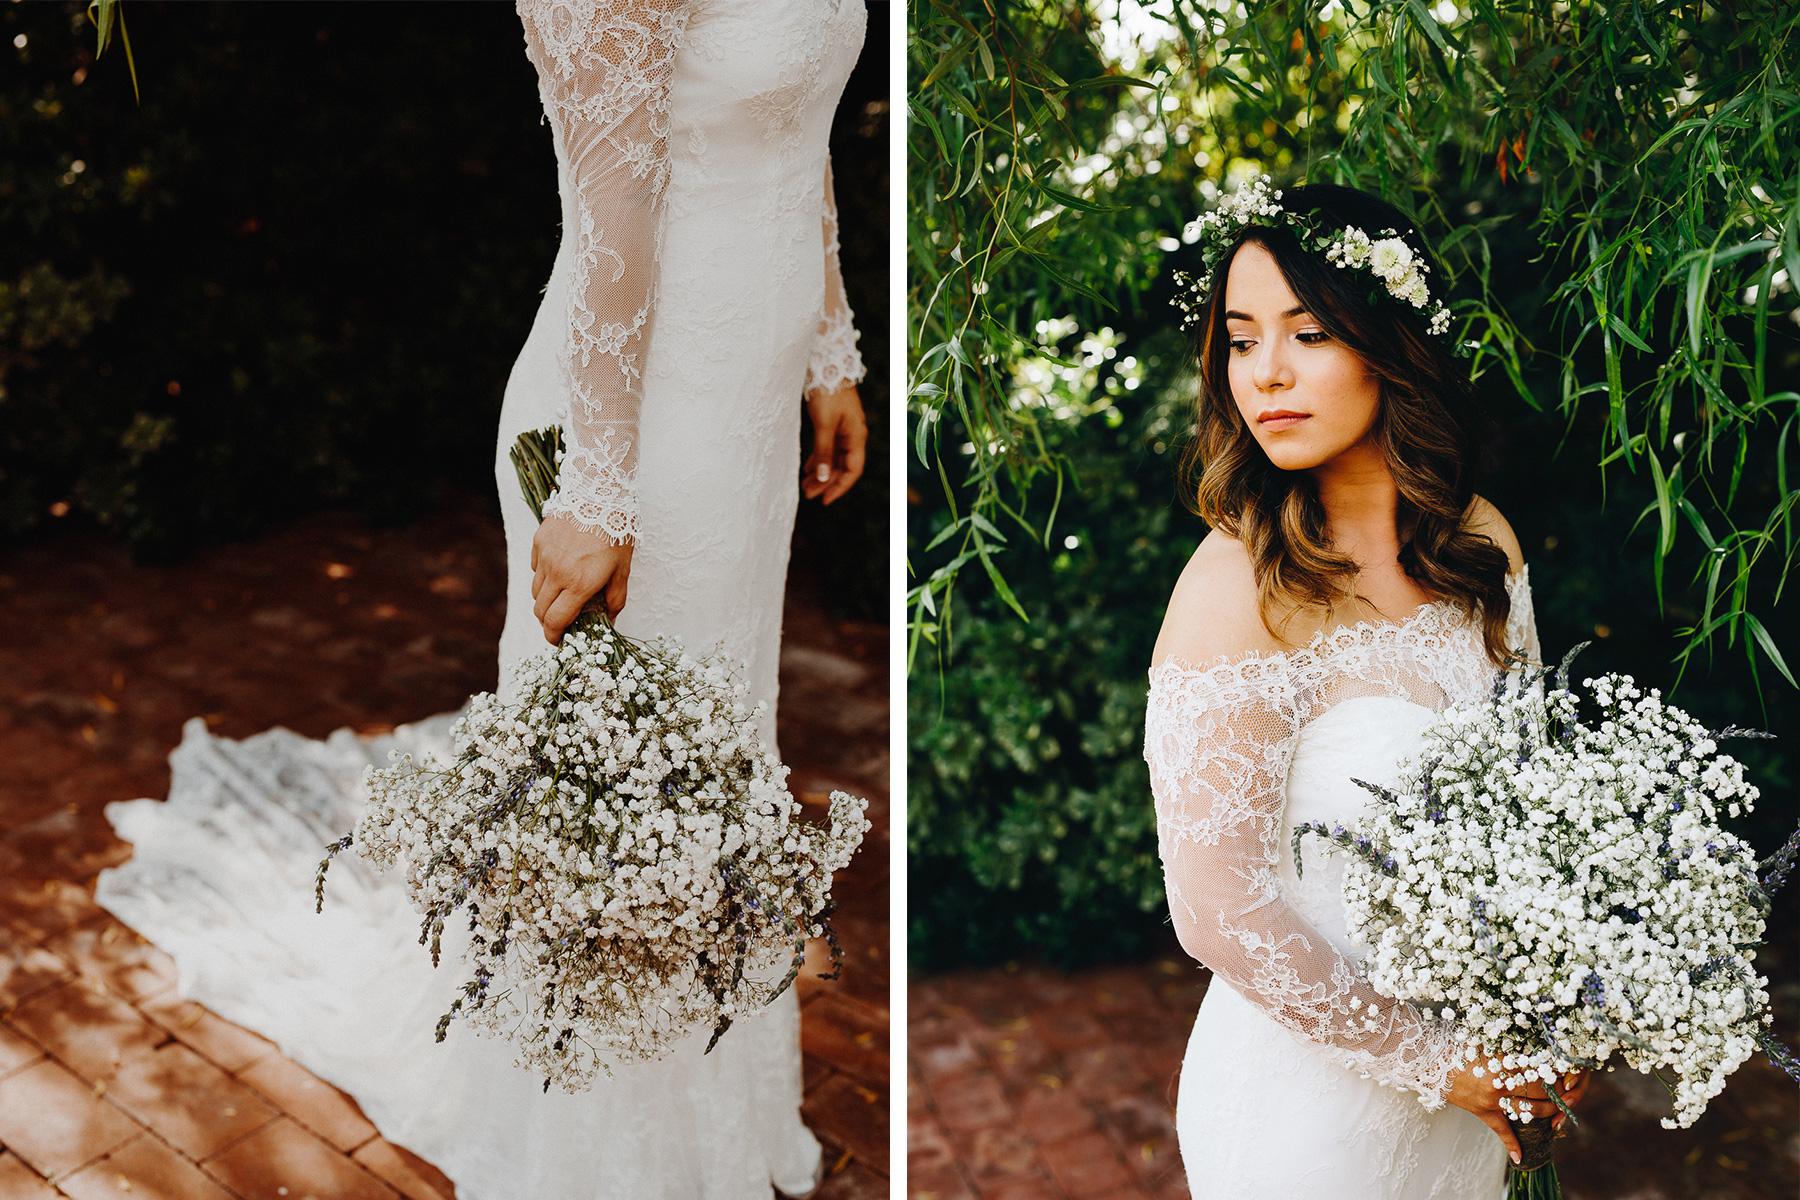 181104-Luxium-Weddings-Arizona-@matt__Le-Brandon-Kariana-Phoenix-Valley-Garden-Center-1022A.jpg